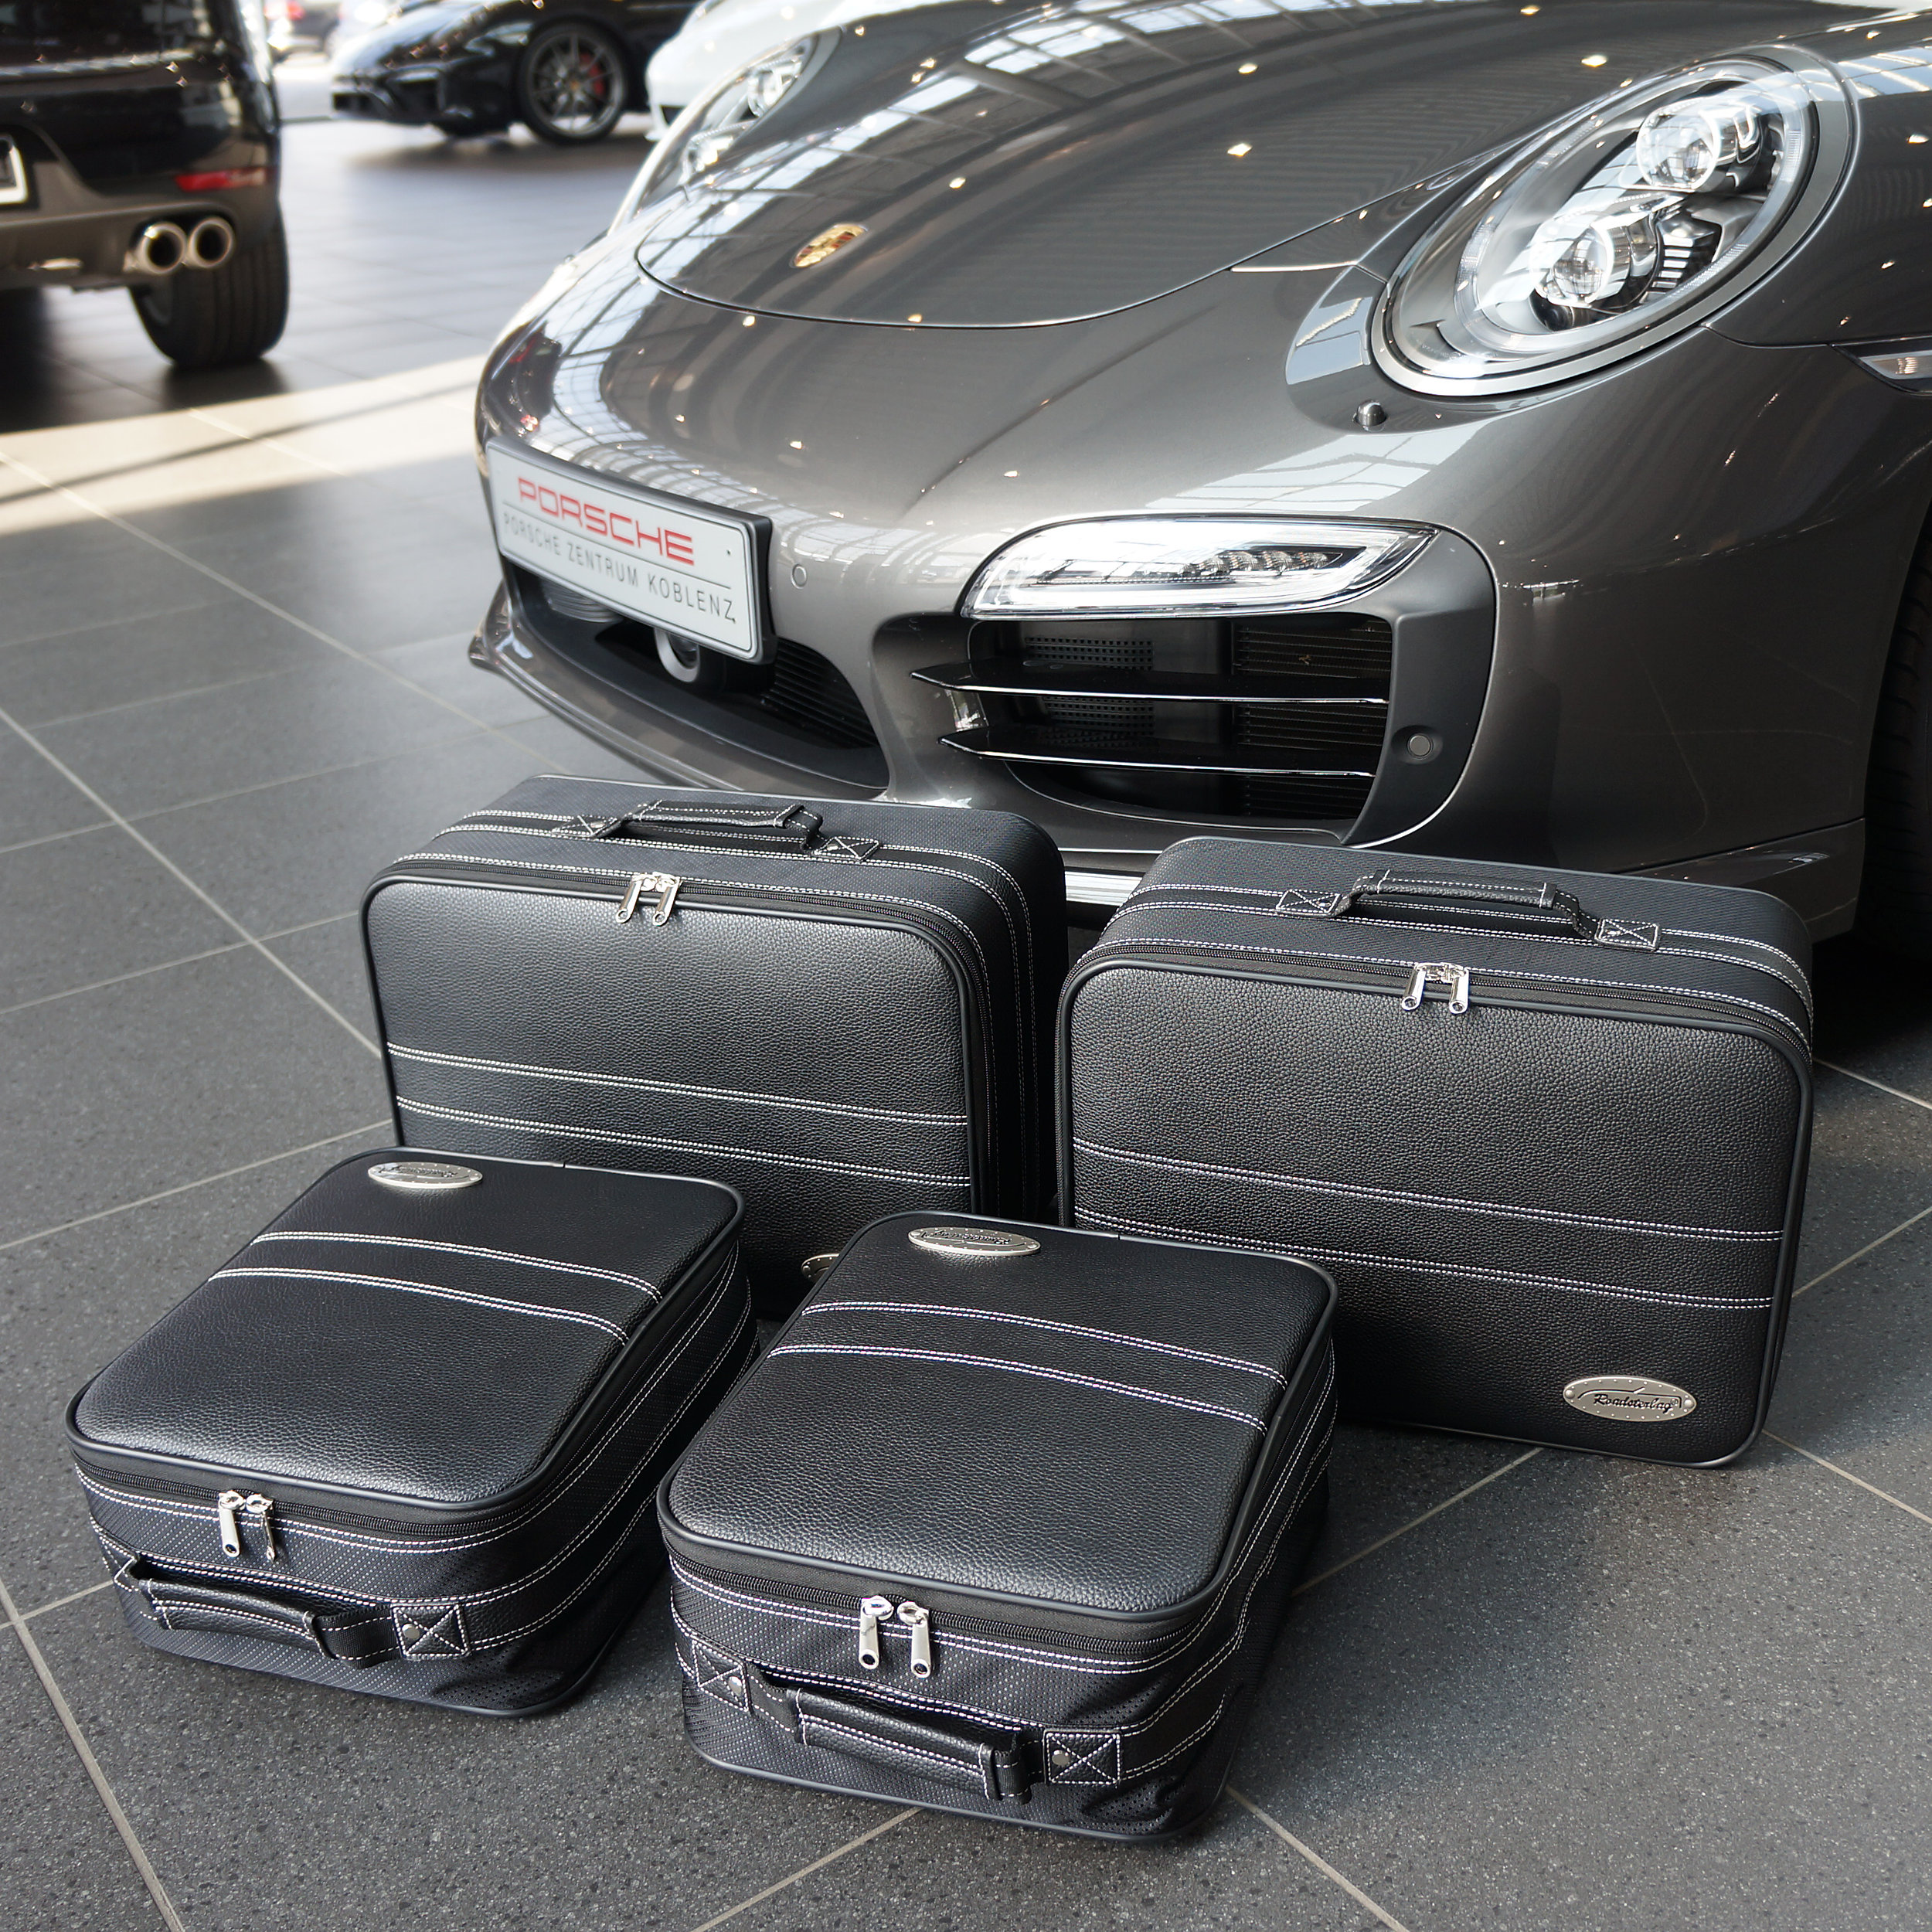 4-tlg. Kofferset Porsche 911 (991+996+997) G-Modell Teilleder XXL 83 Liter